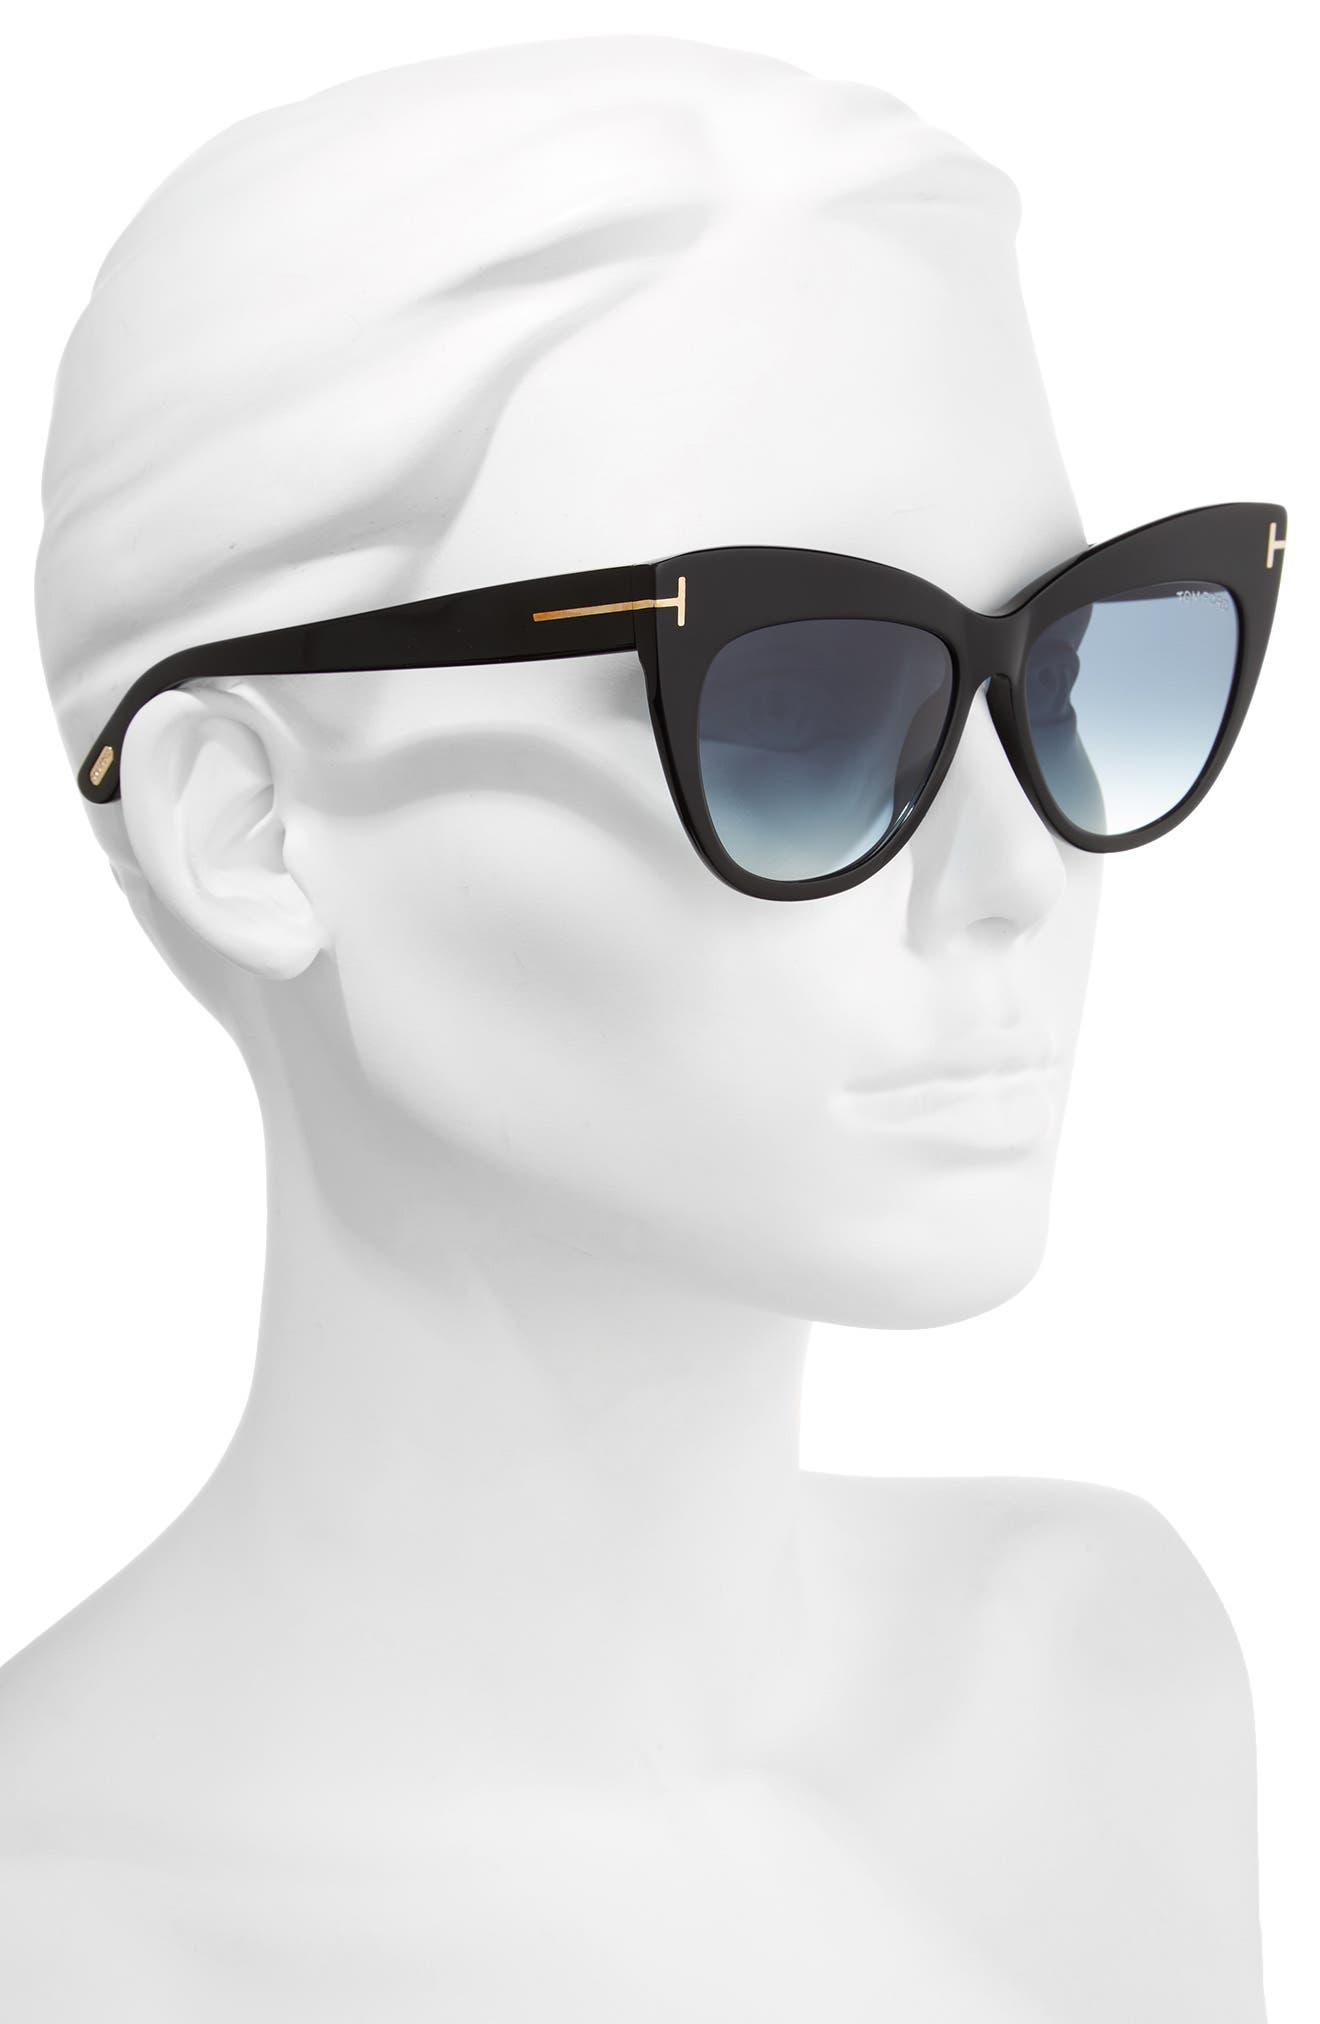 Nika 56mm Gradient Cat Eye Sunglasses,                             Alternate thumbnail 2, color,                             Shiny Black/ Gradient Blue